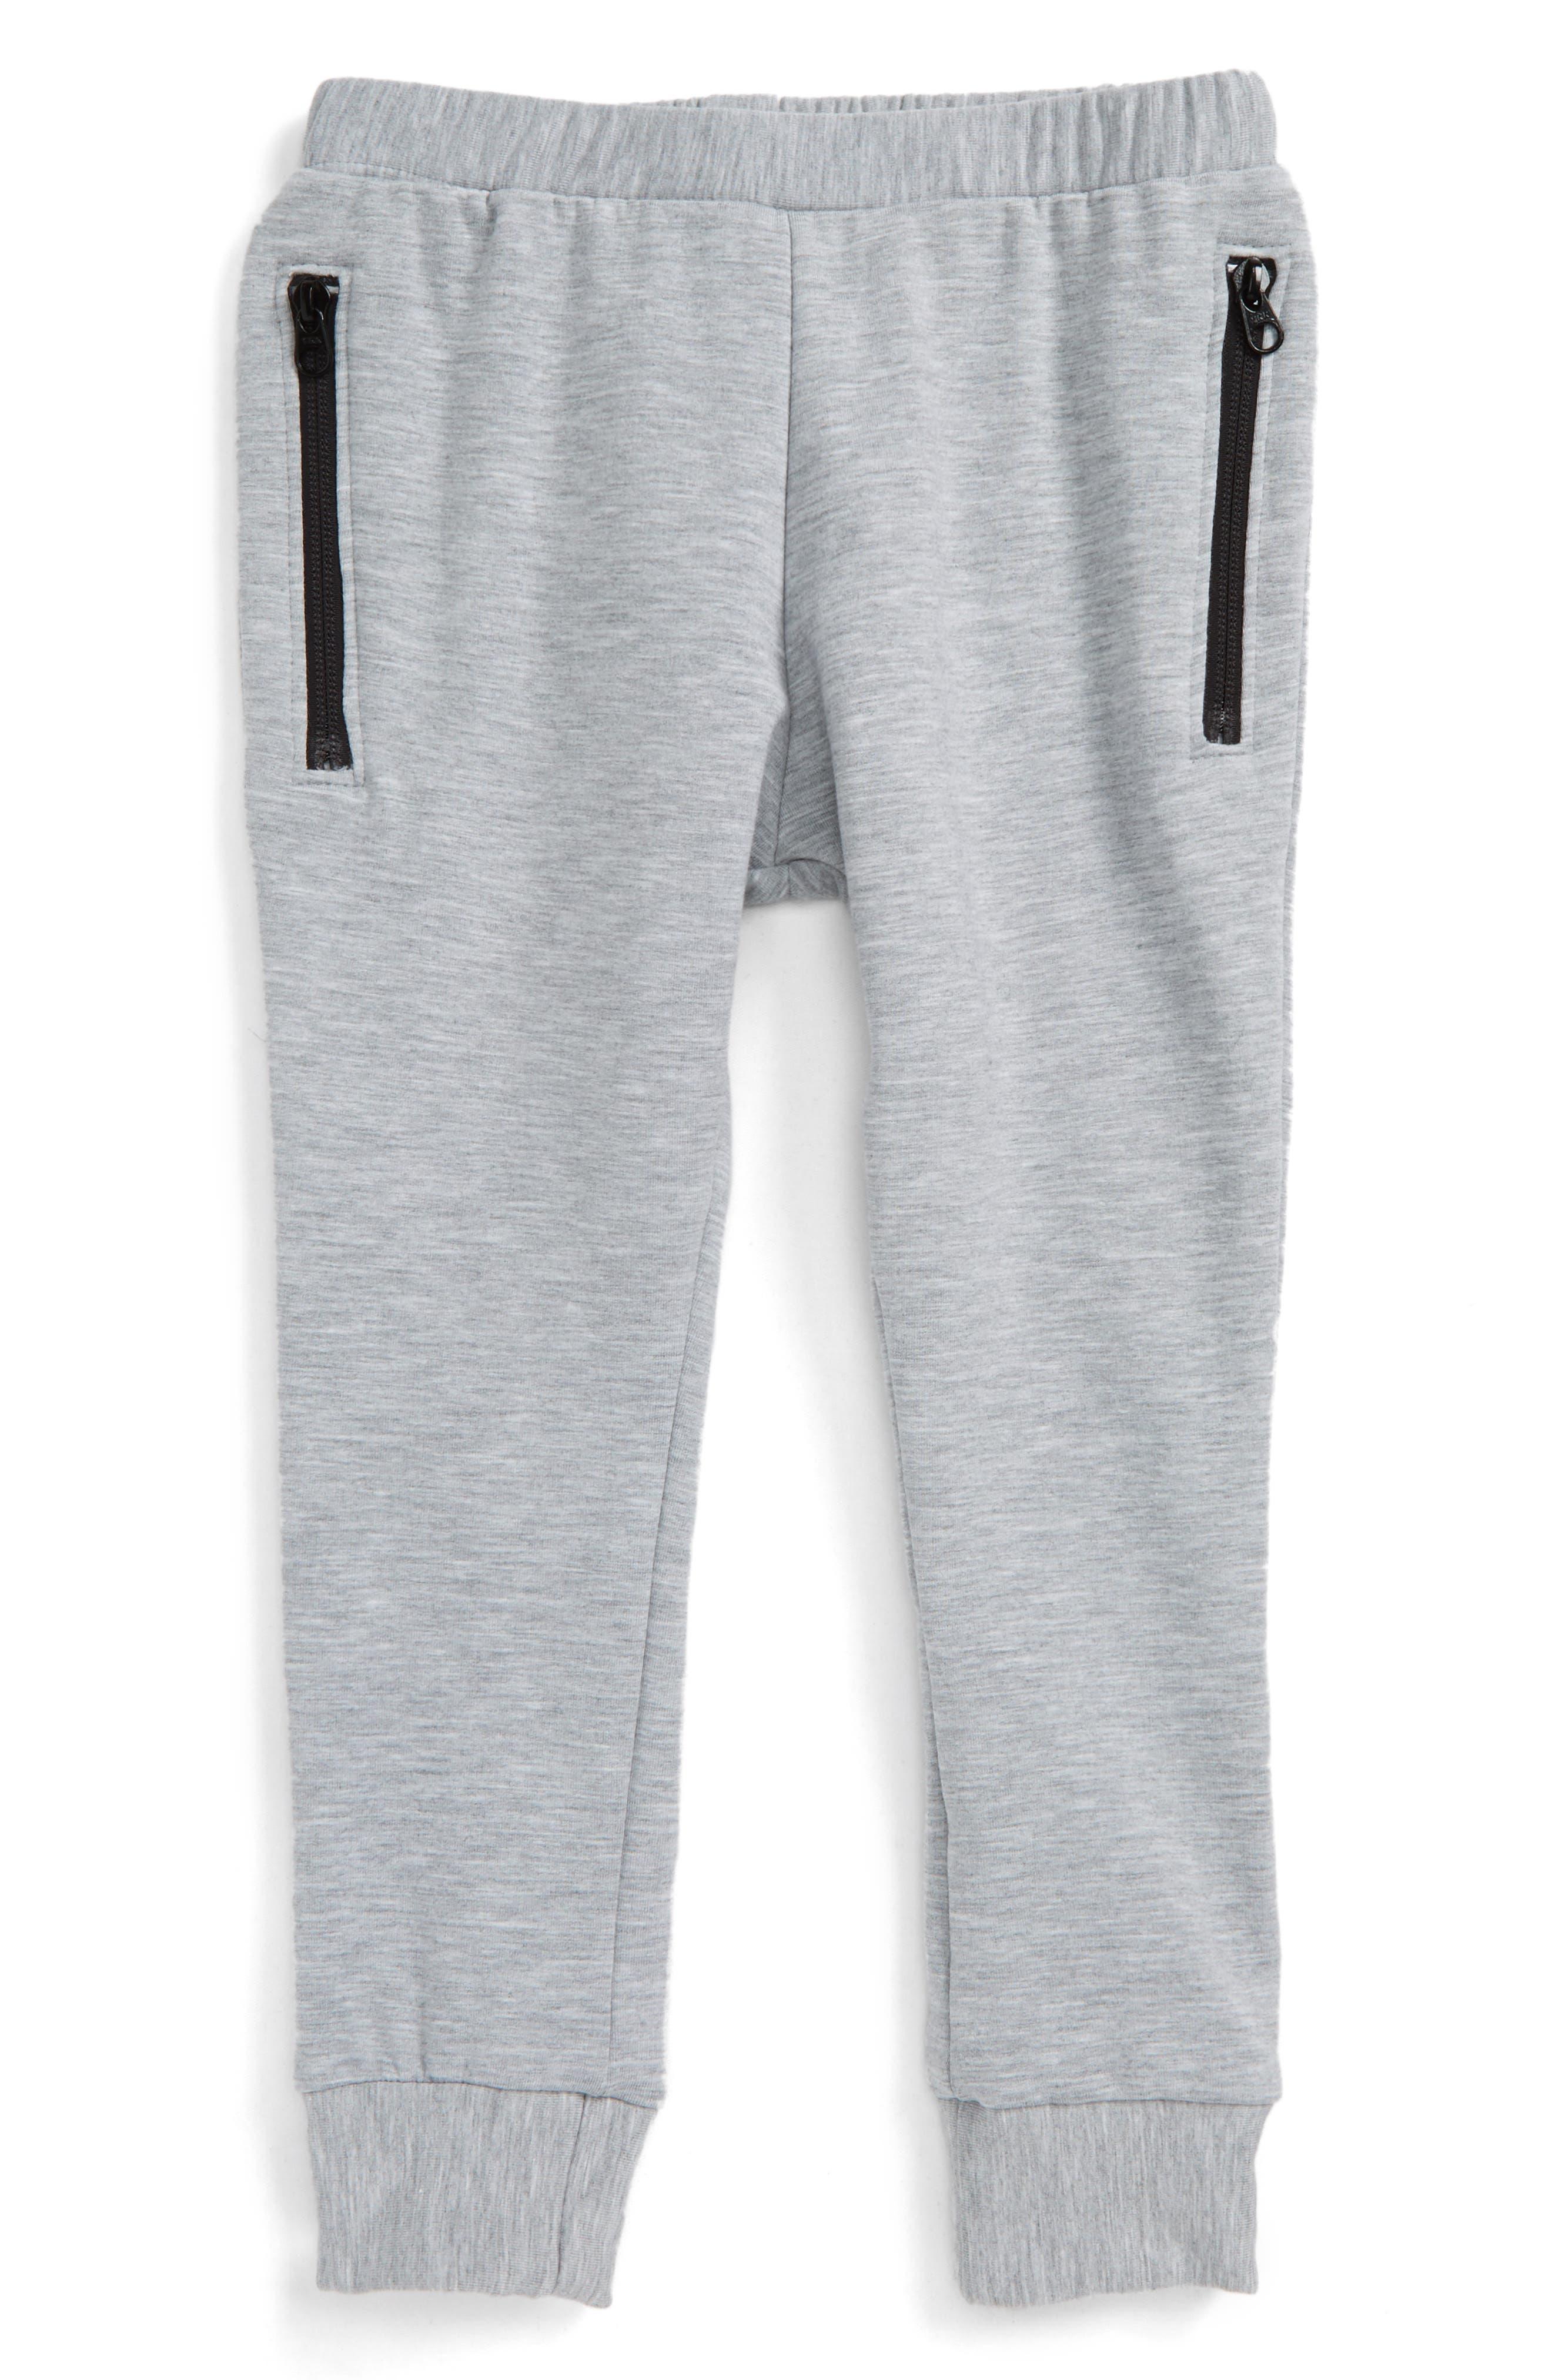 Philips Sweatpants,                             Main thumbnail 1, color,                             Grey